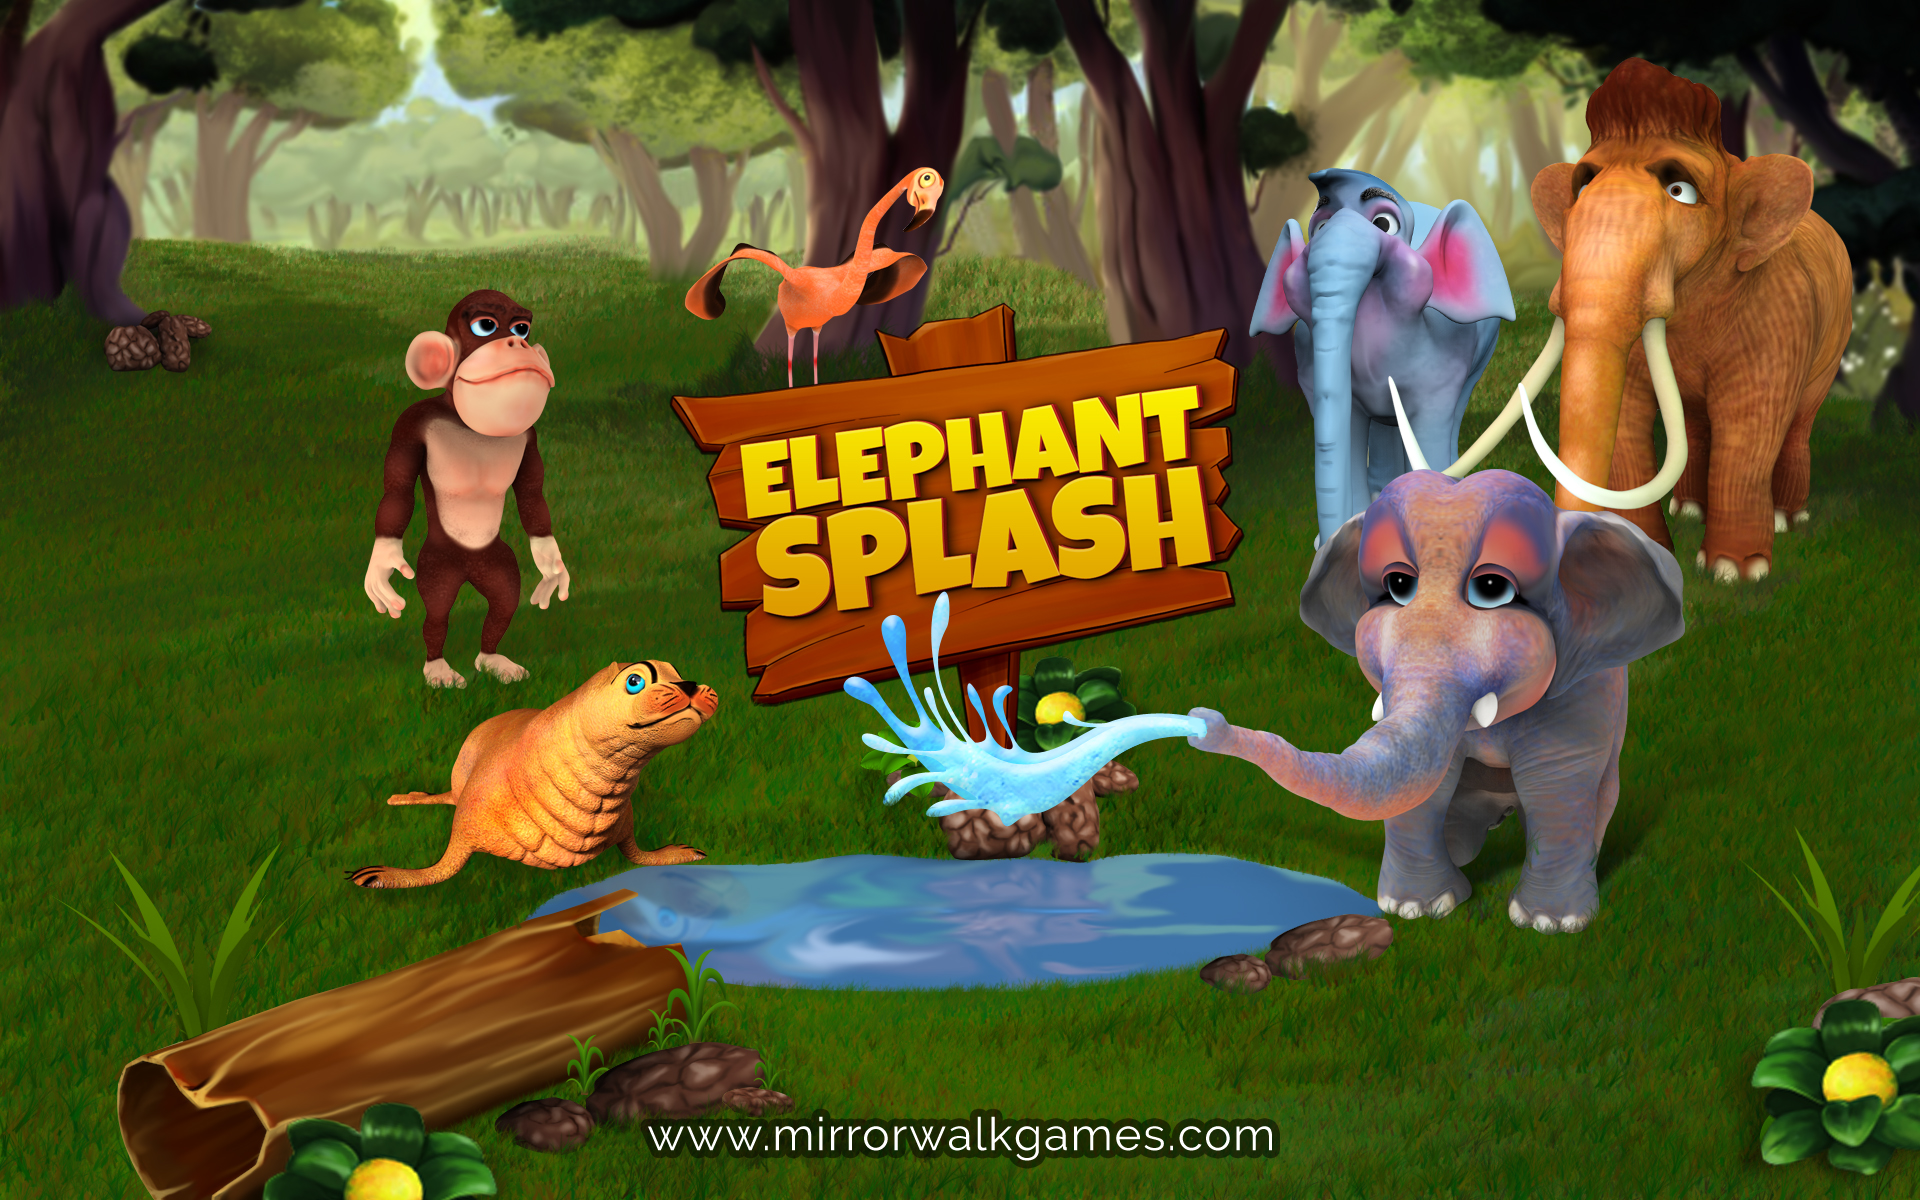 elephant splash game teaser file - Indie DB Elephant Games